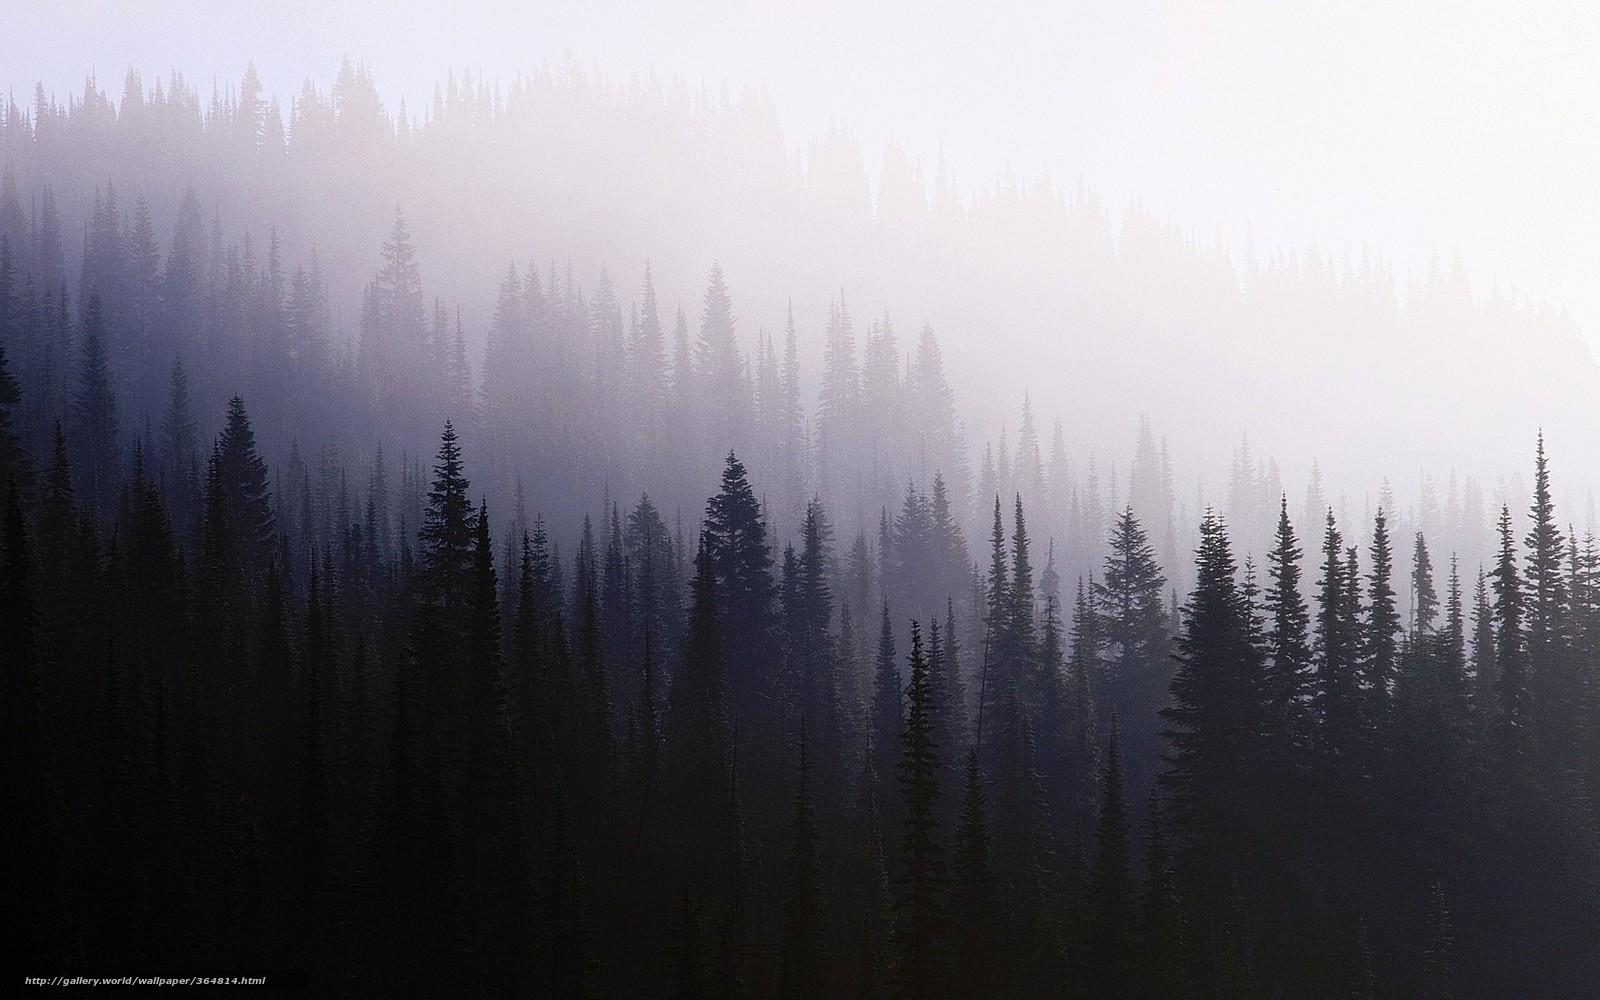 Скачать обои лес, фон, хвойные, туман ...: ru.gde-fon.com/download/les_fon_xvojnye_tuman/364814/1680x1050